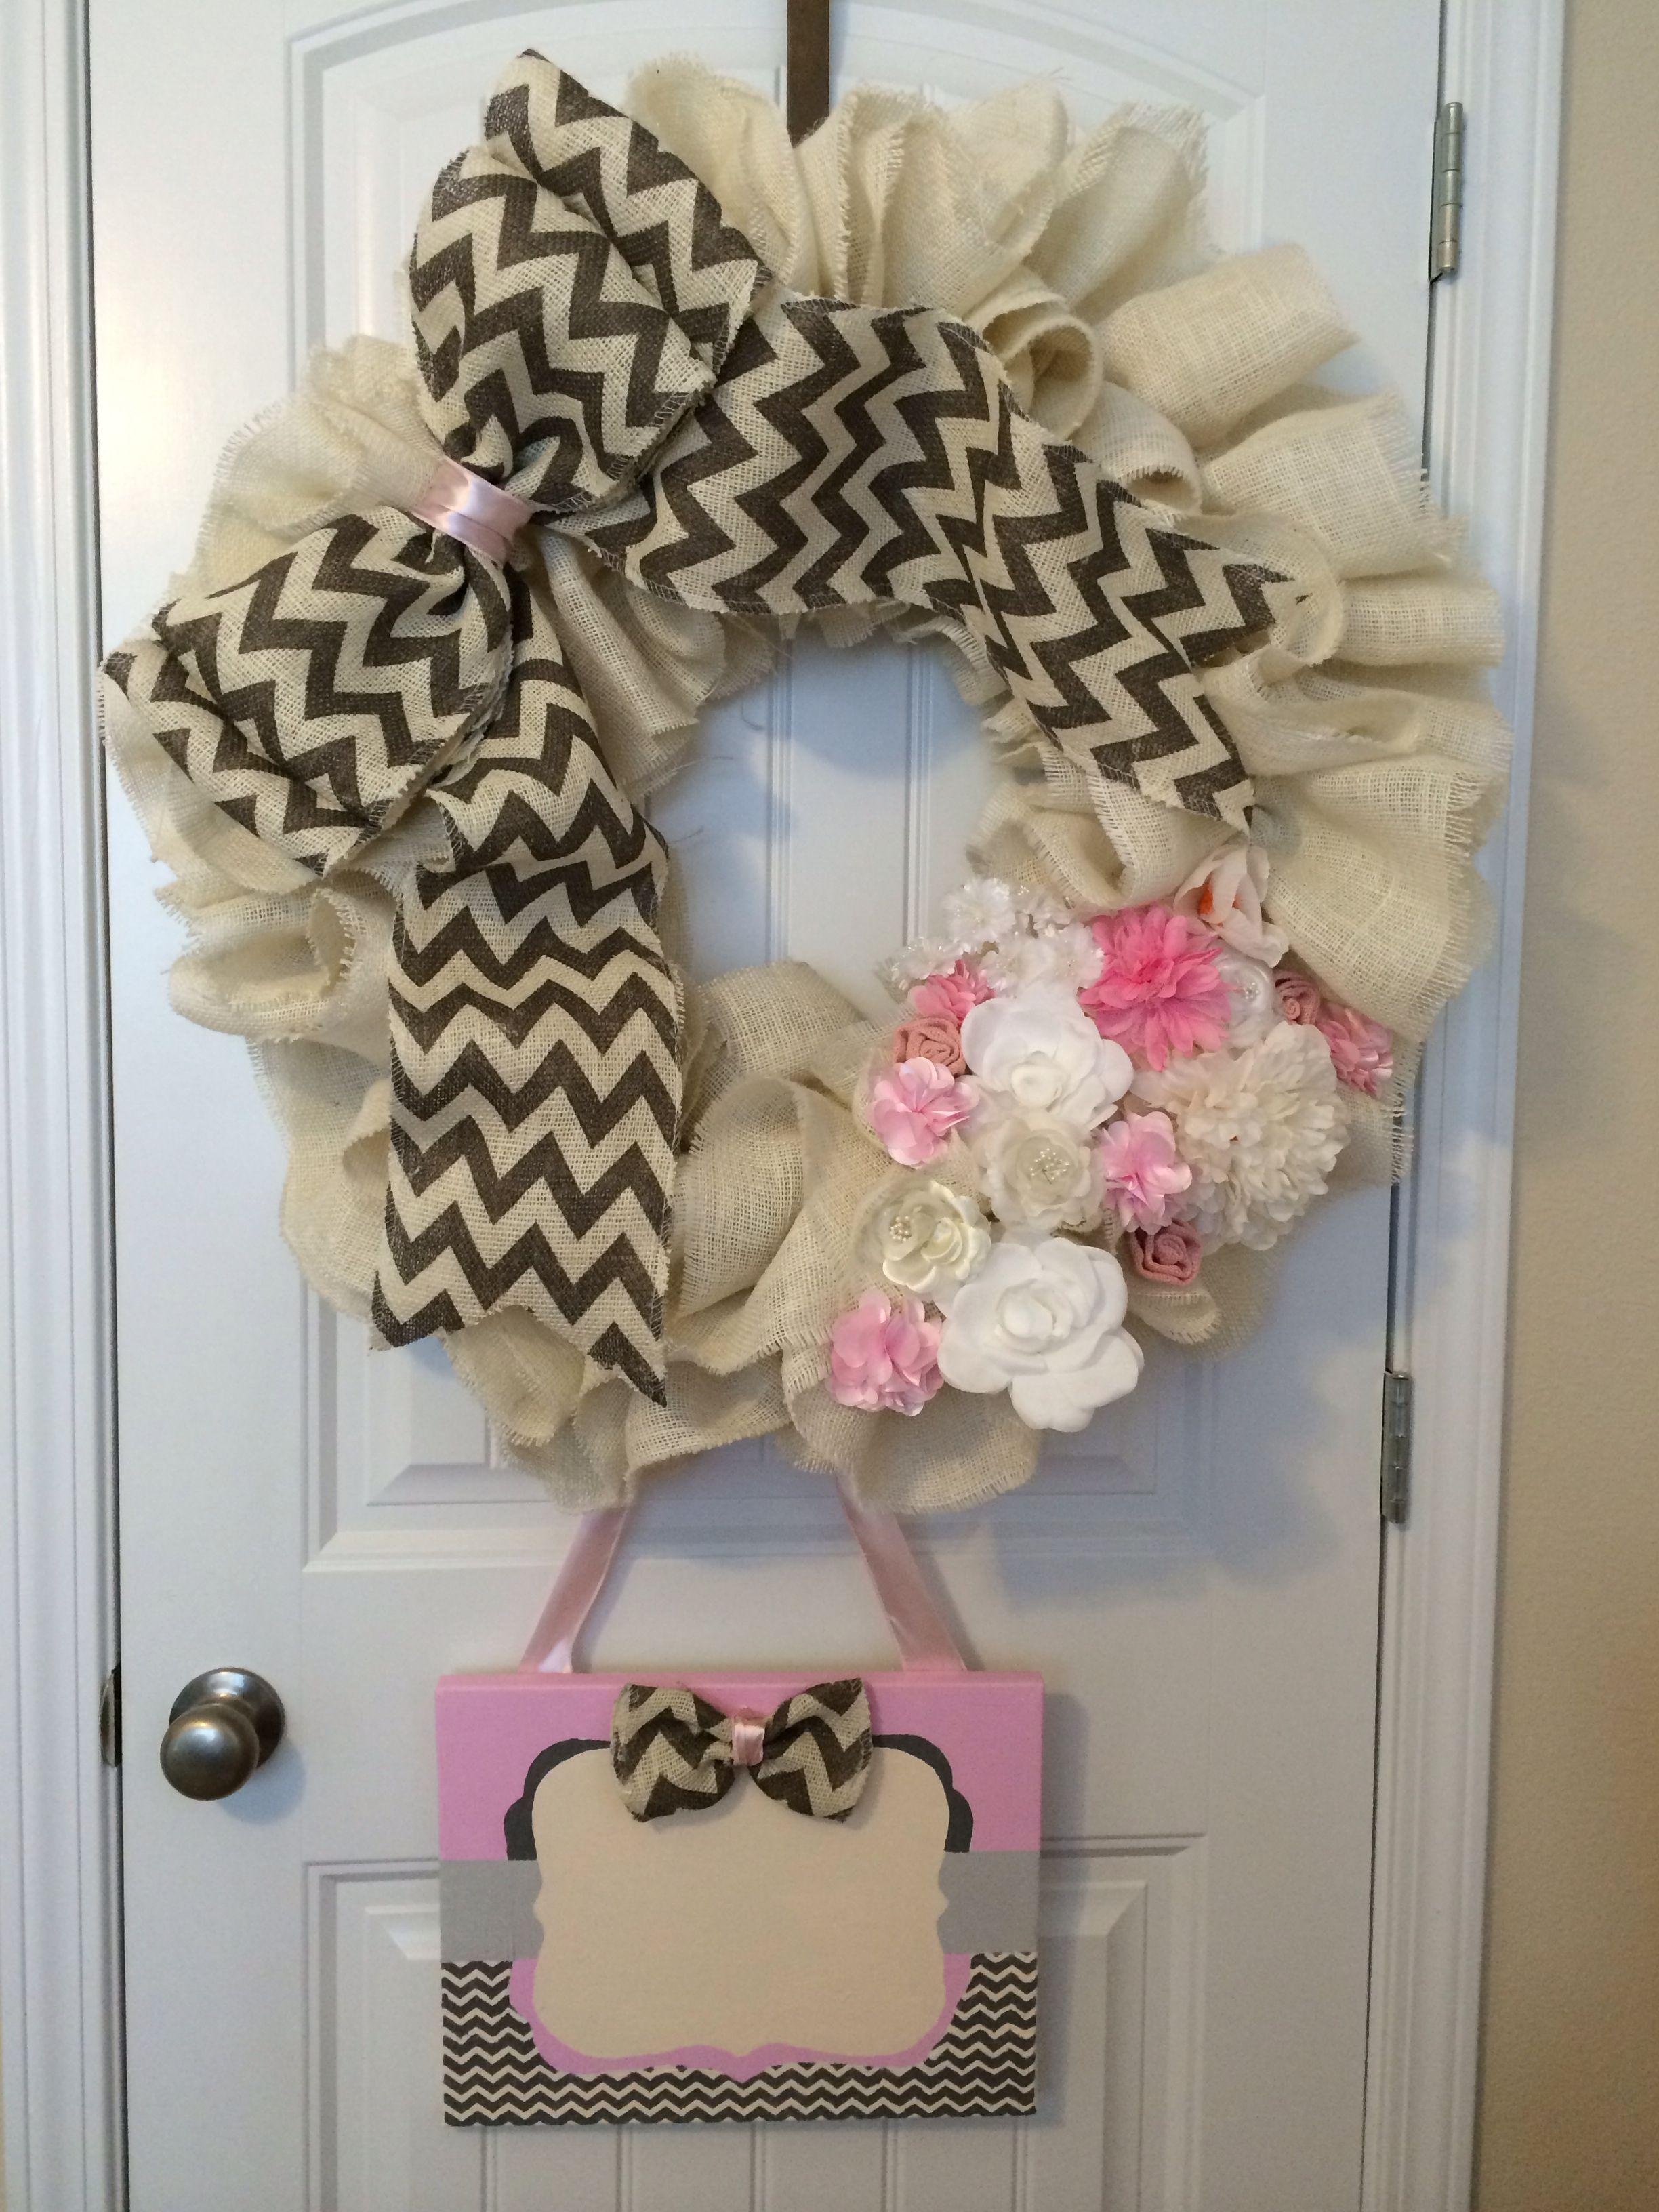 Baby Girl Birth Announcement Wreath for Hospital door